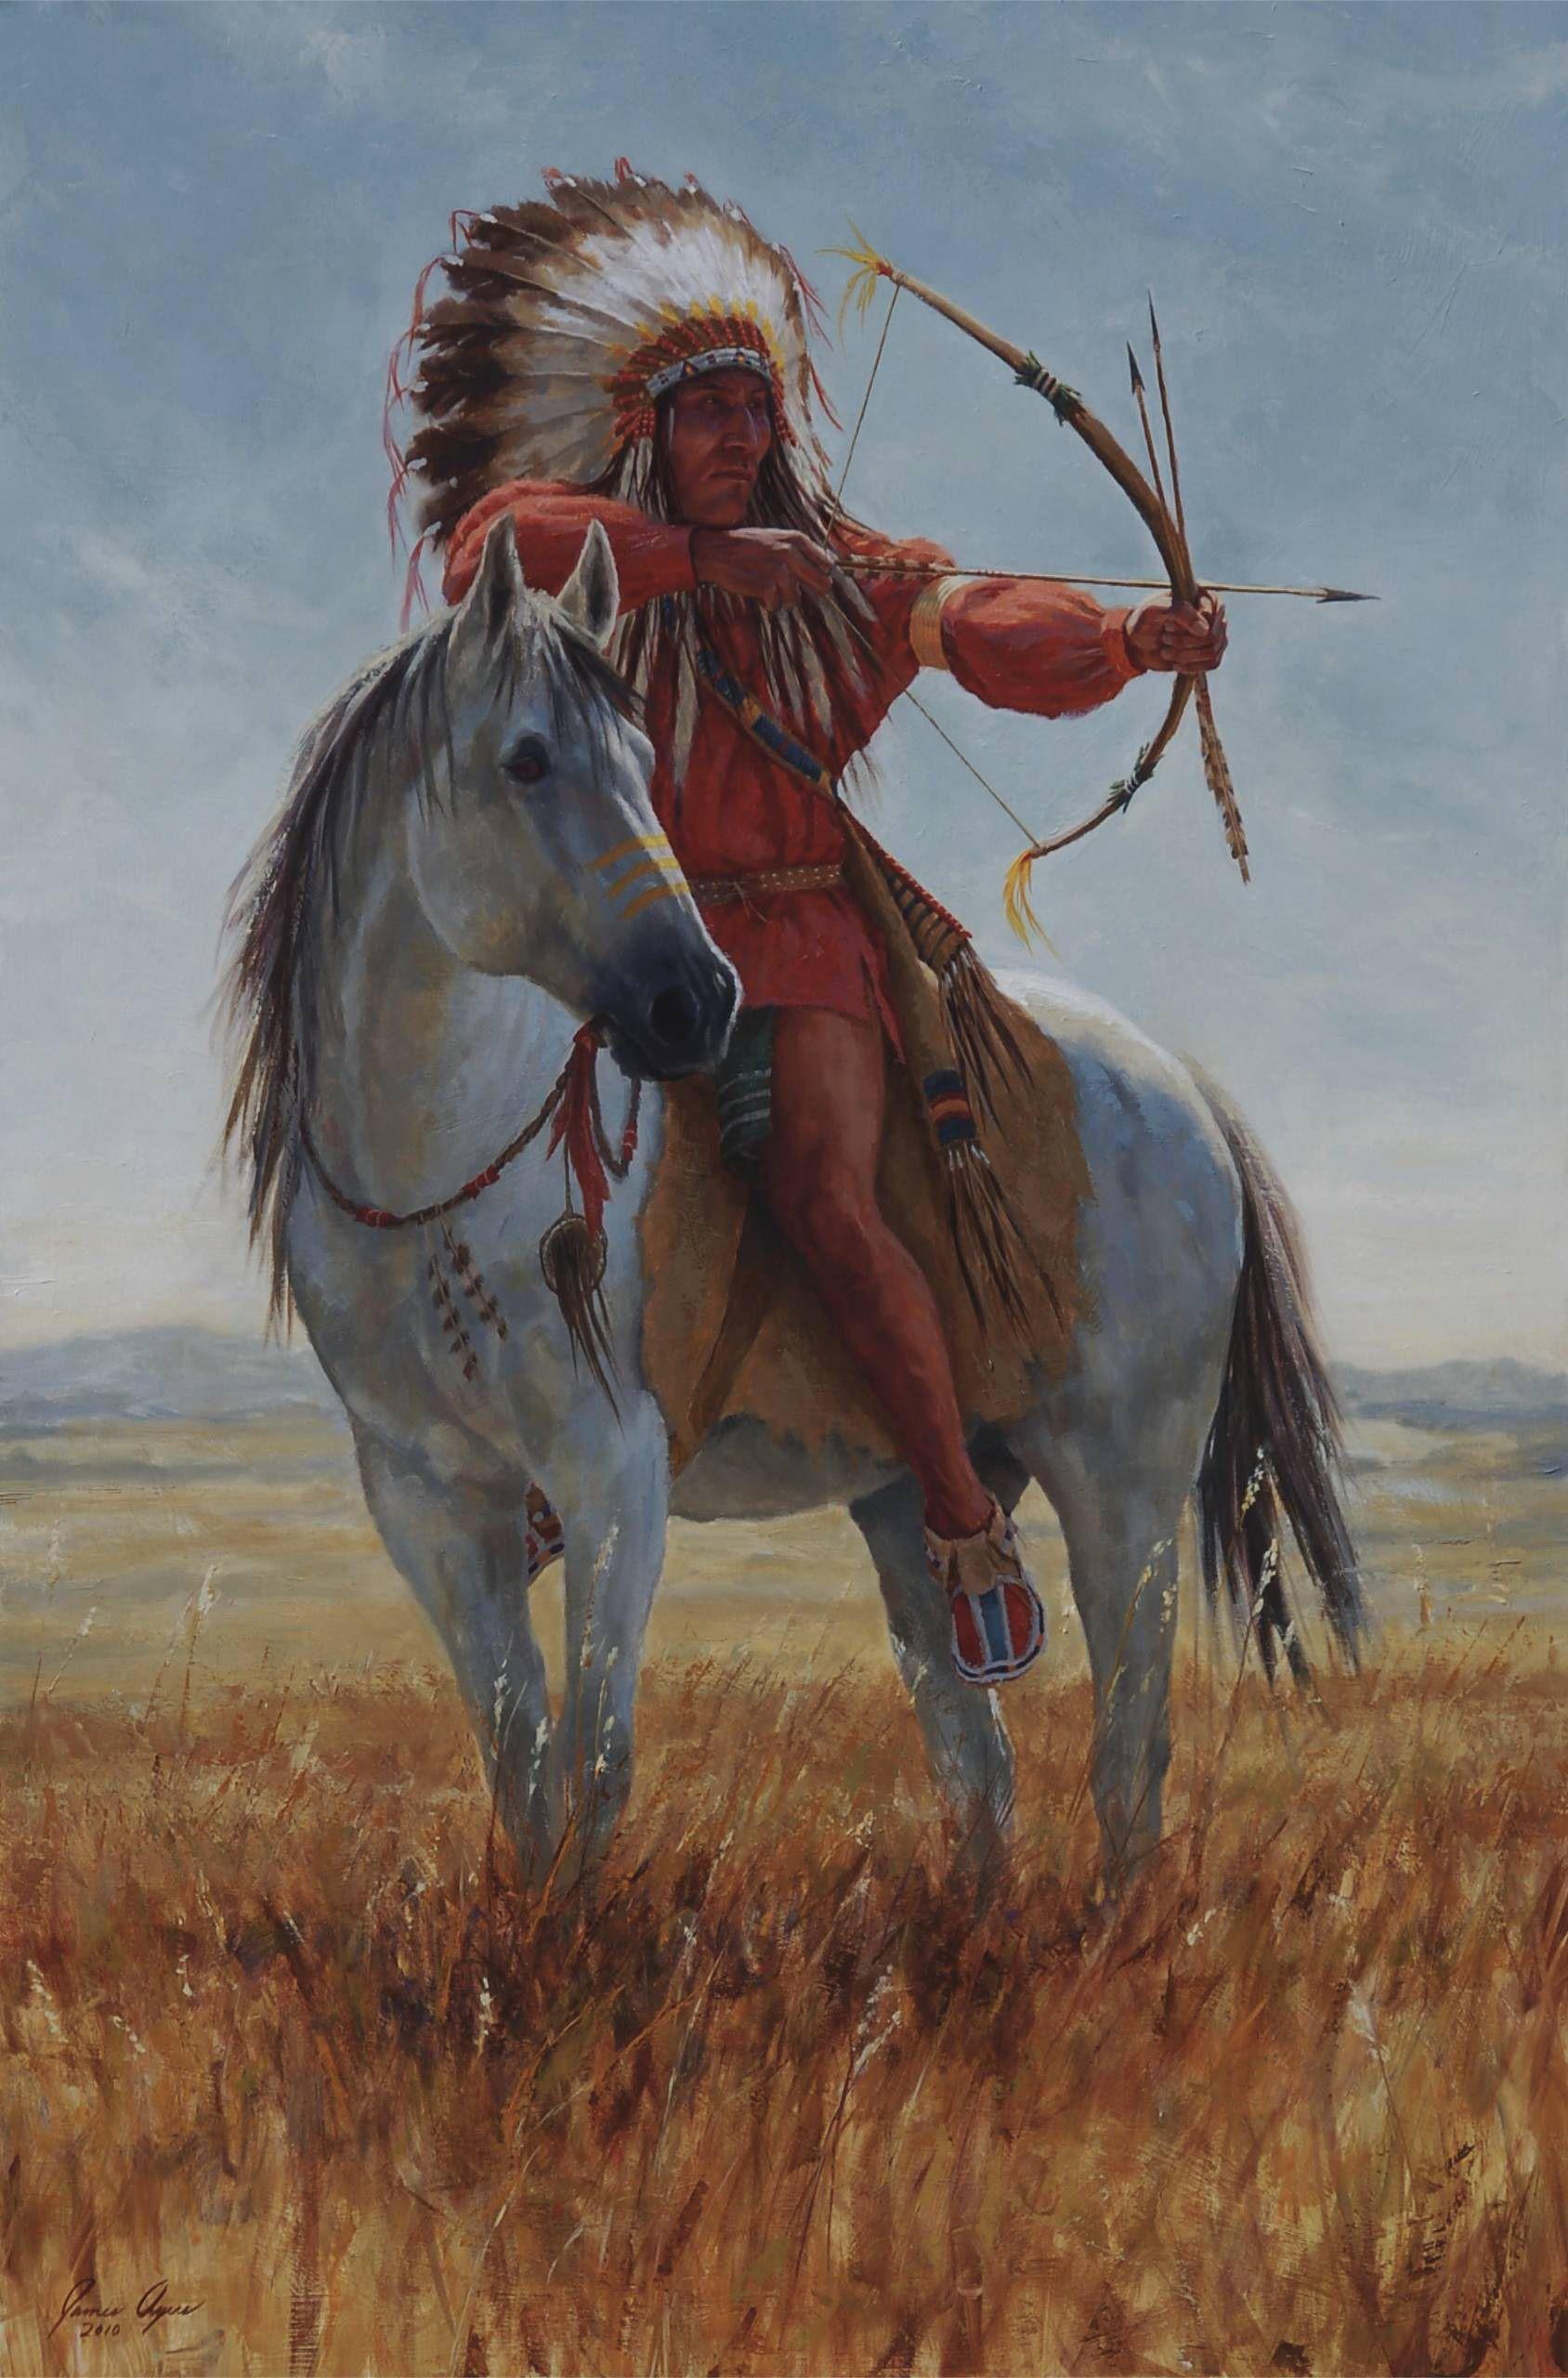 Western American Indian Warrior Paintings | Available Paintings Taking Aim – James Ayers Studios                                                                                                                                                                                 Más